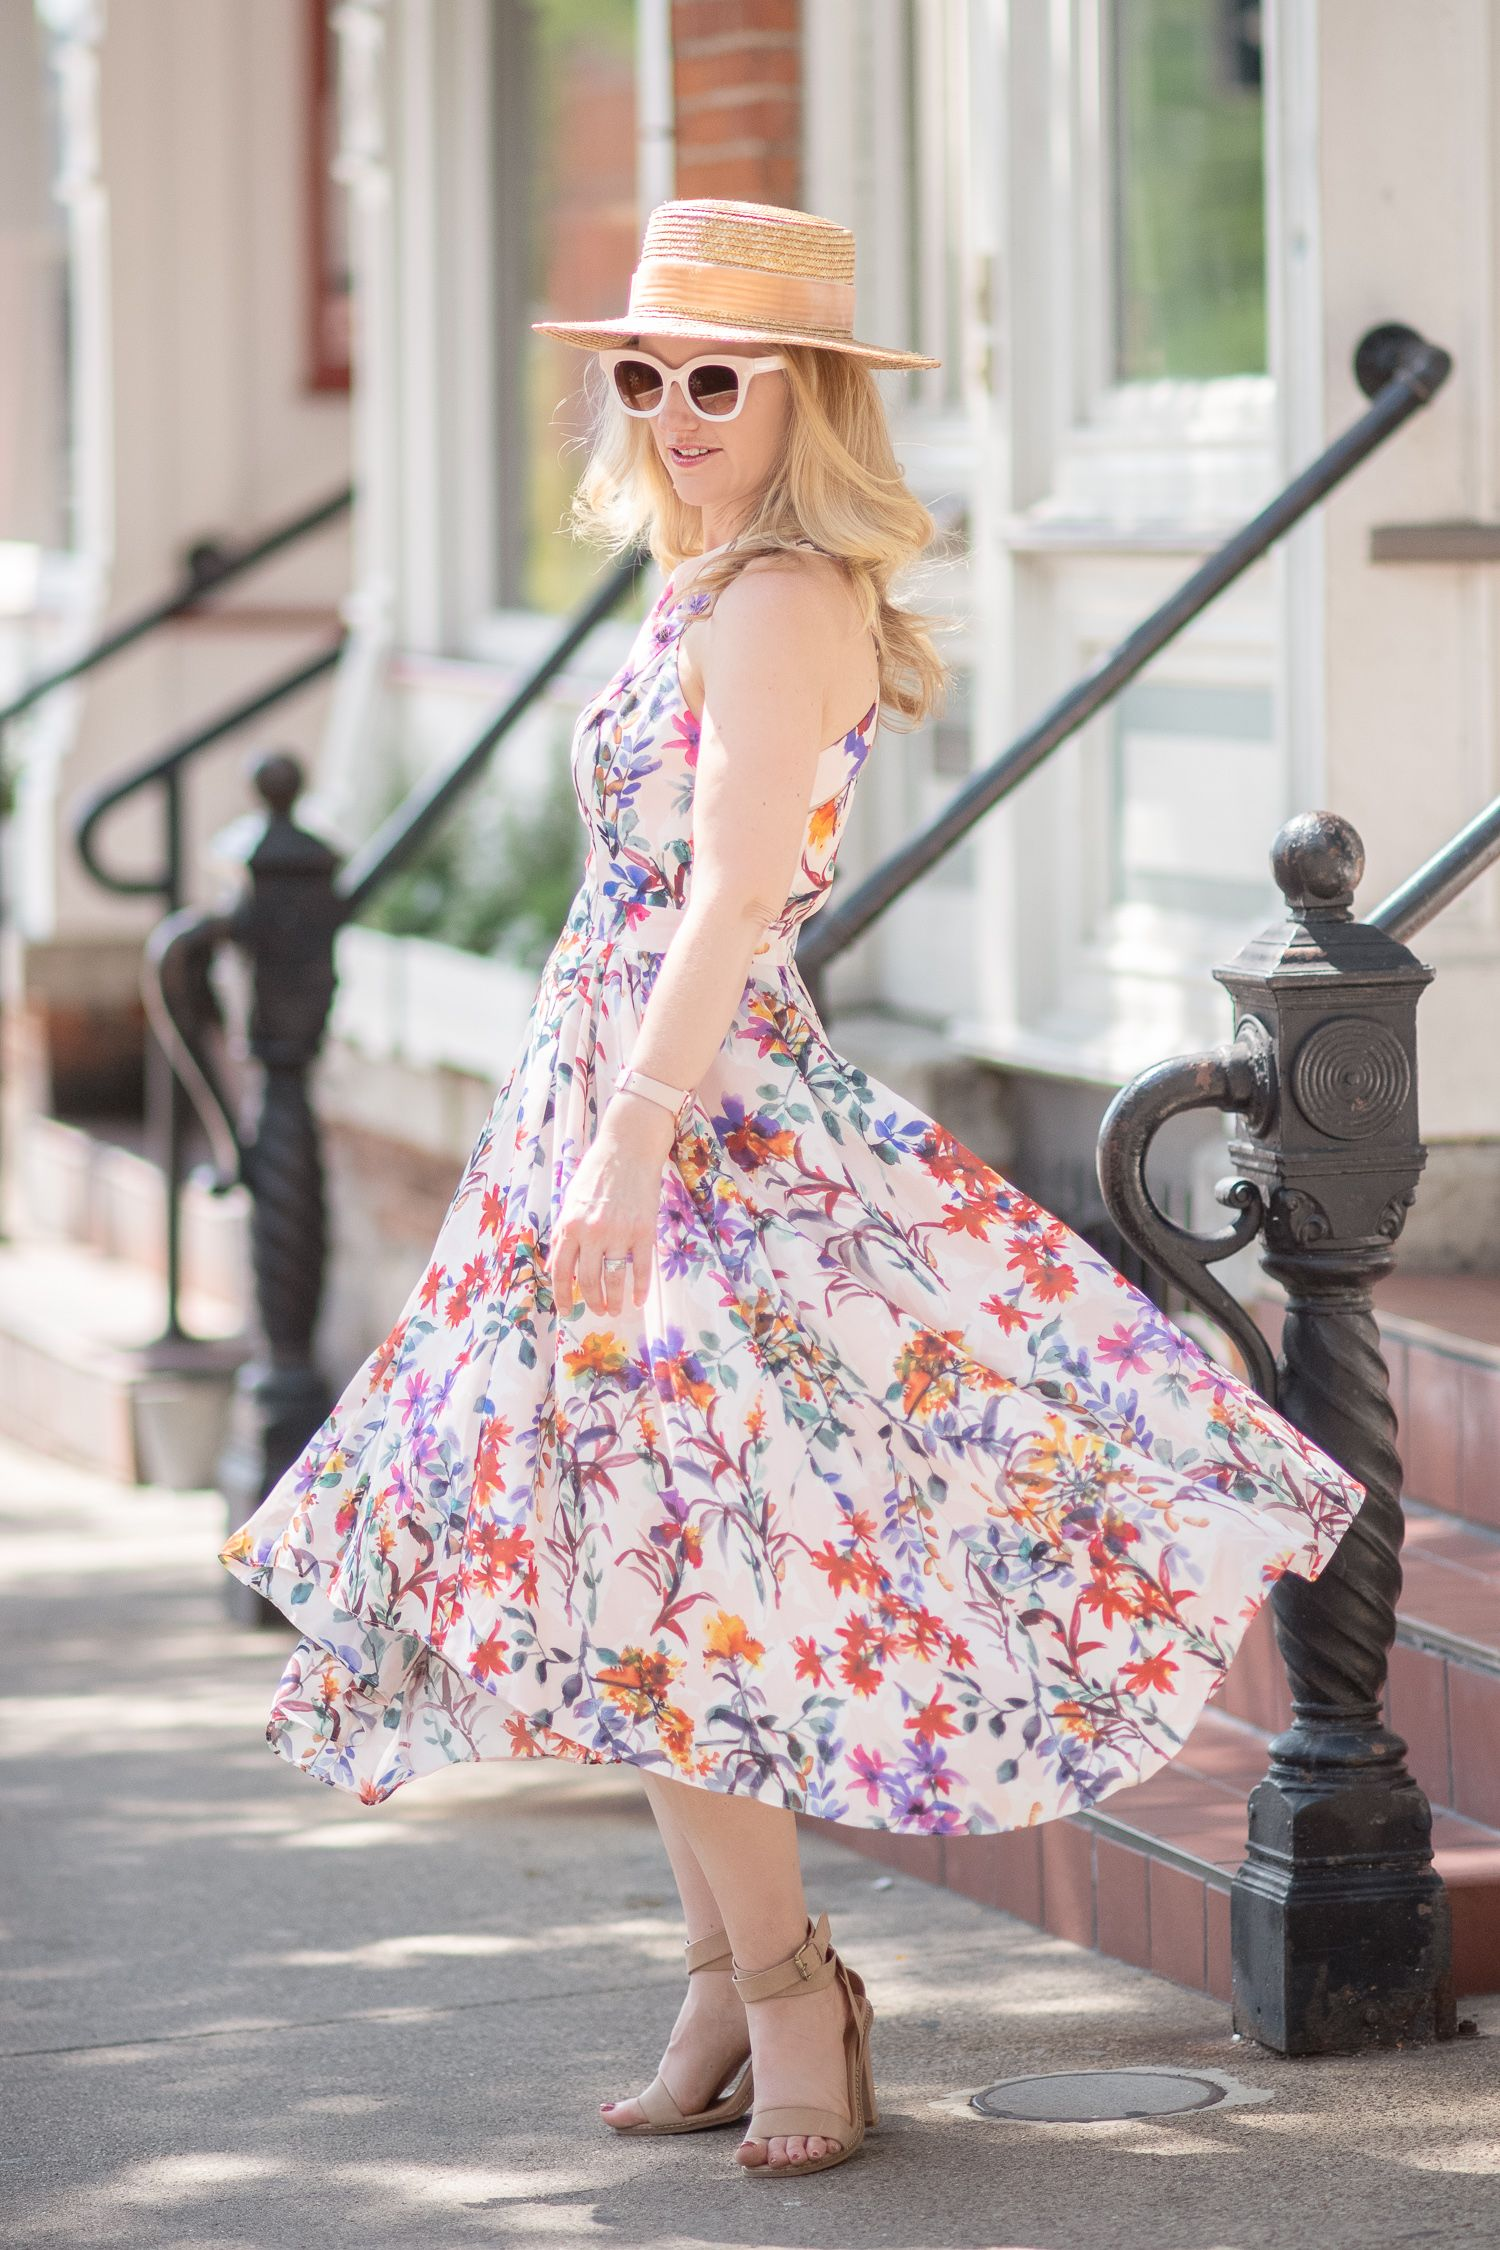 Amazon Fashion Finds Summer Dresses Fashion Petite Fashion Summer Fashion Dresses [ 2250 x 1500 Pixel ]